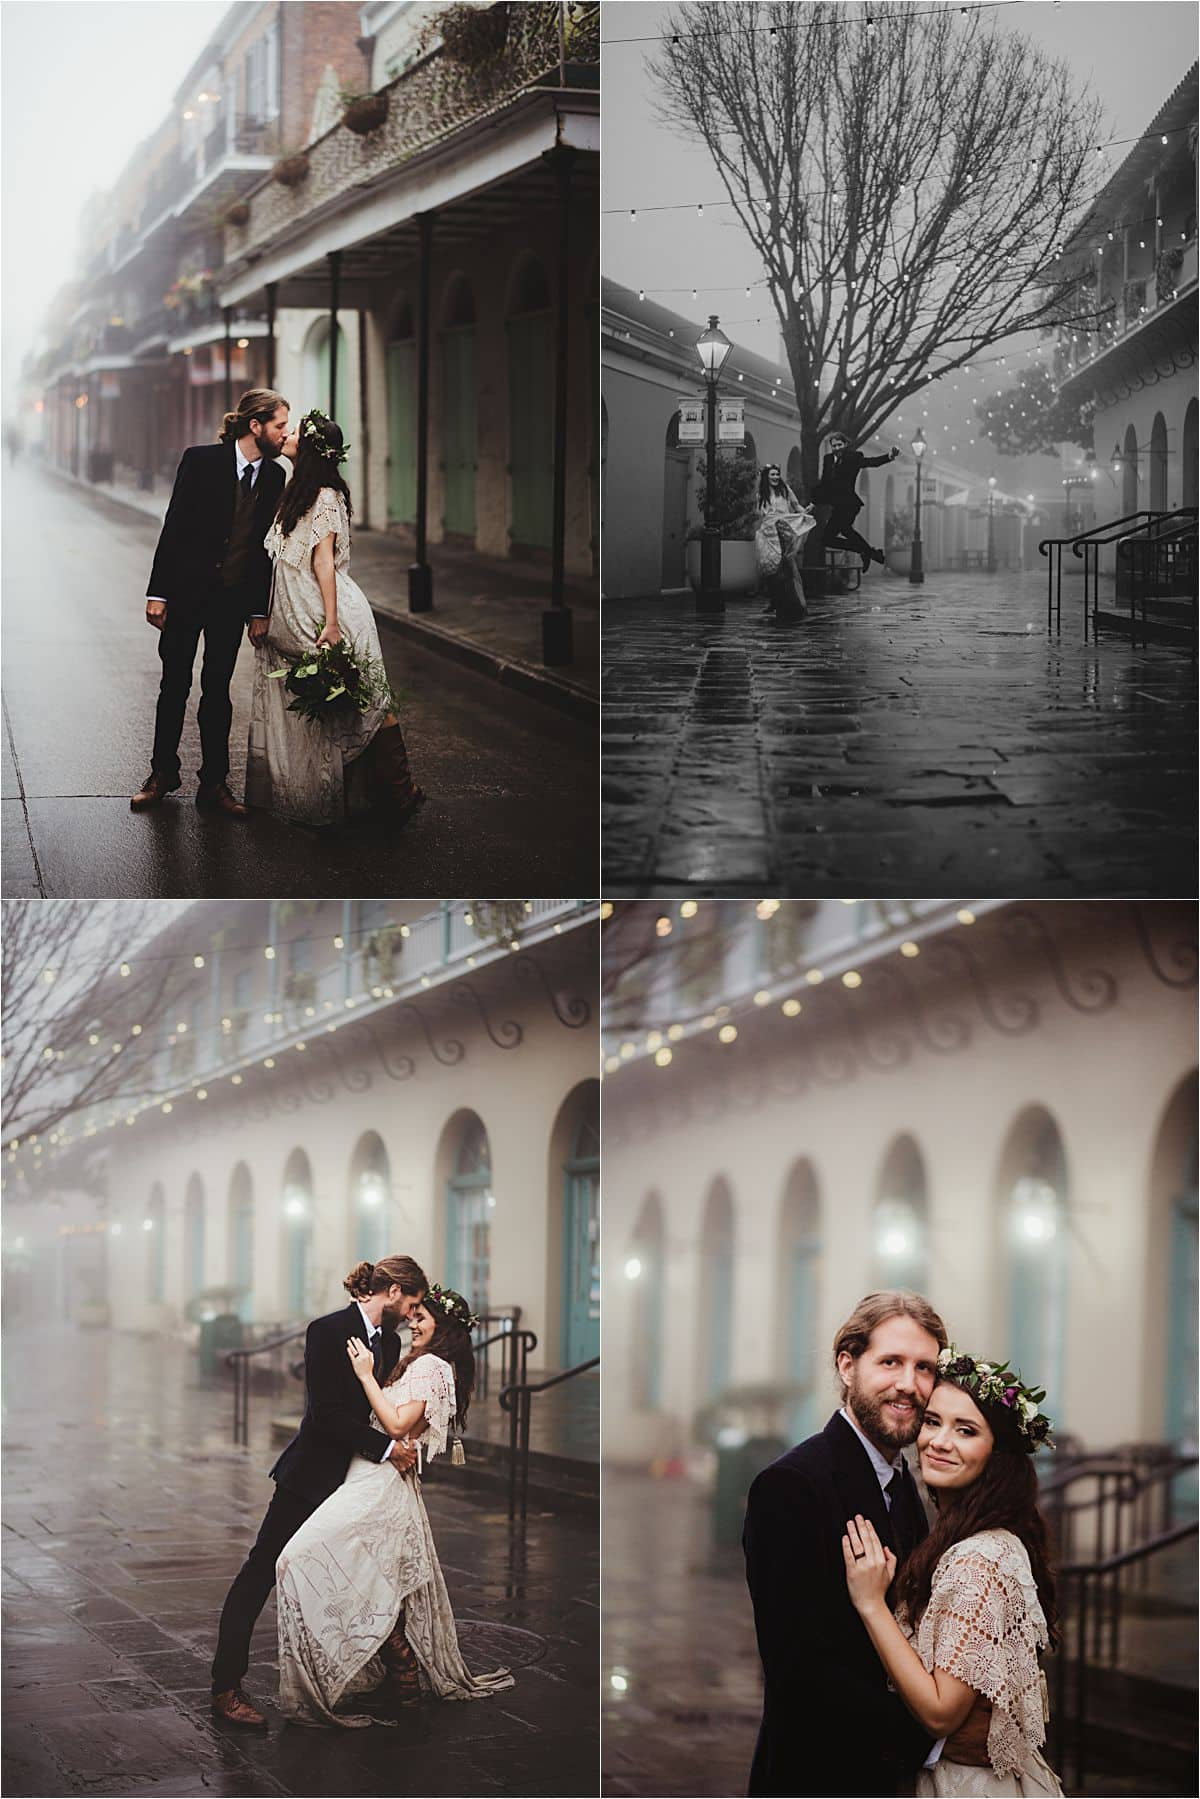 Rainy Day Stylized Wedding Couple on Misty Street